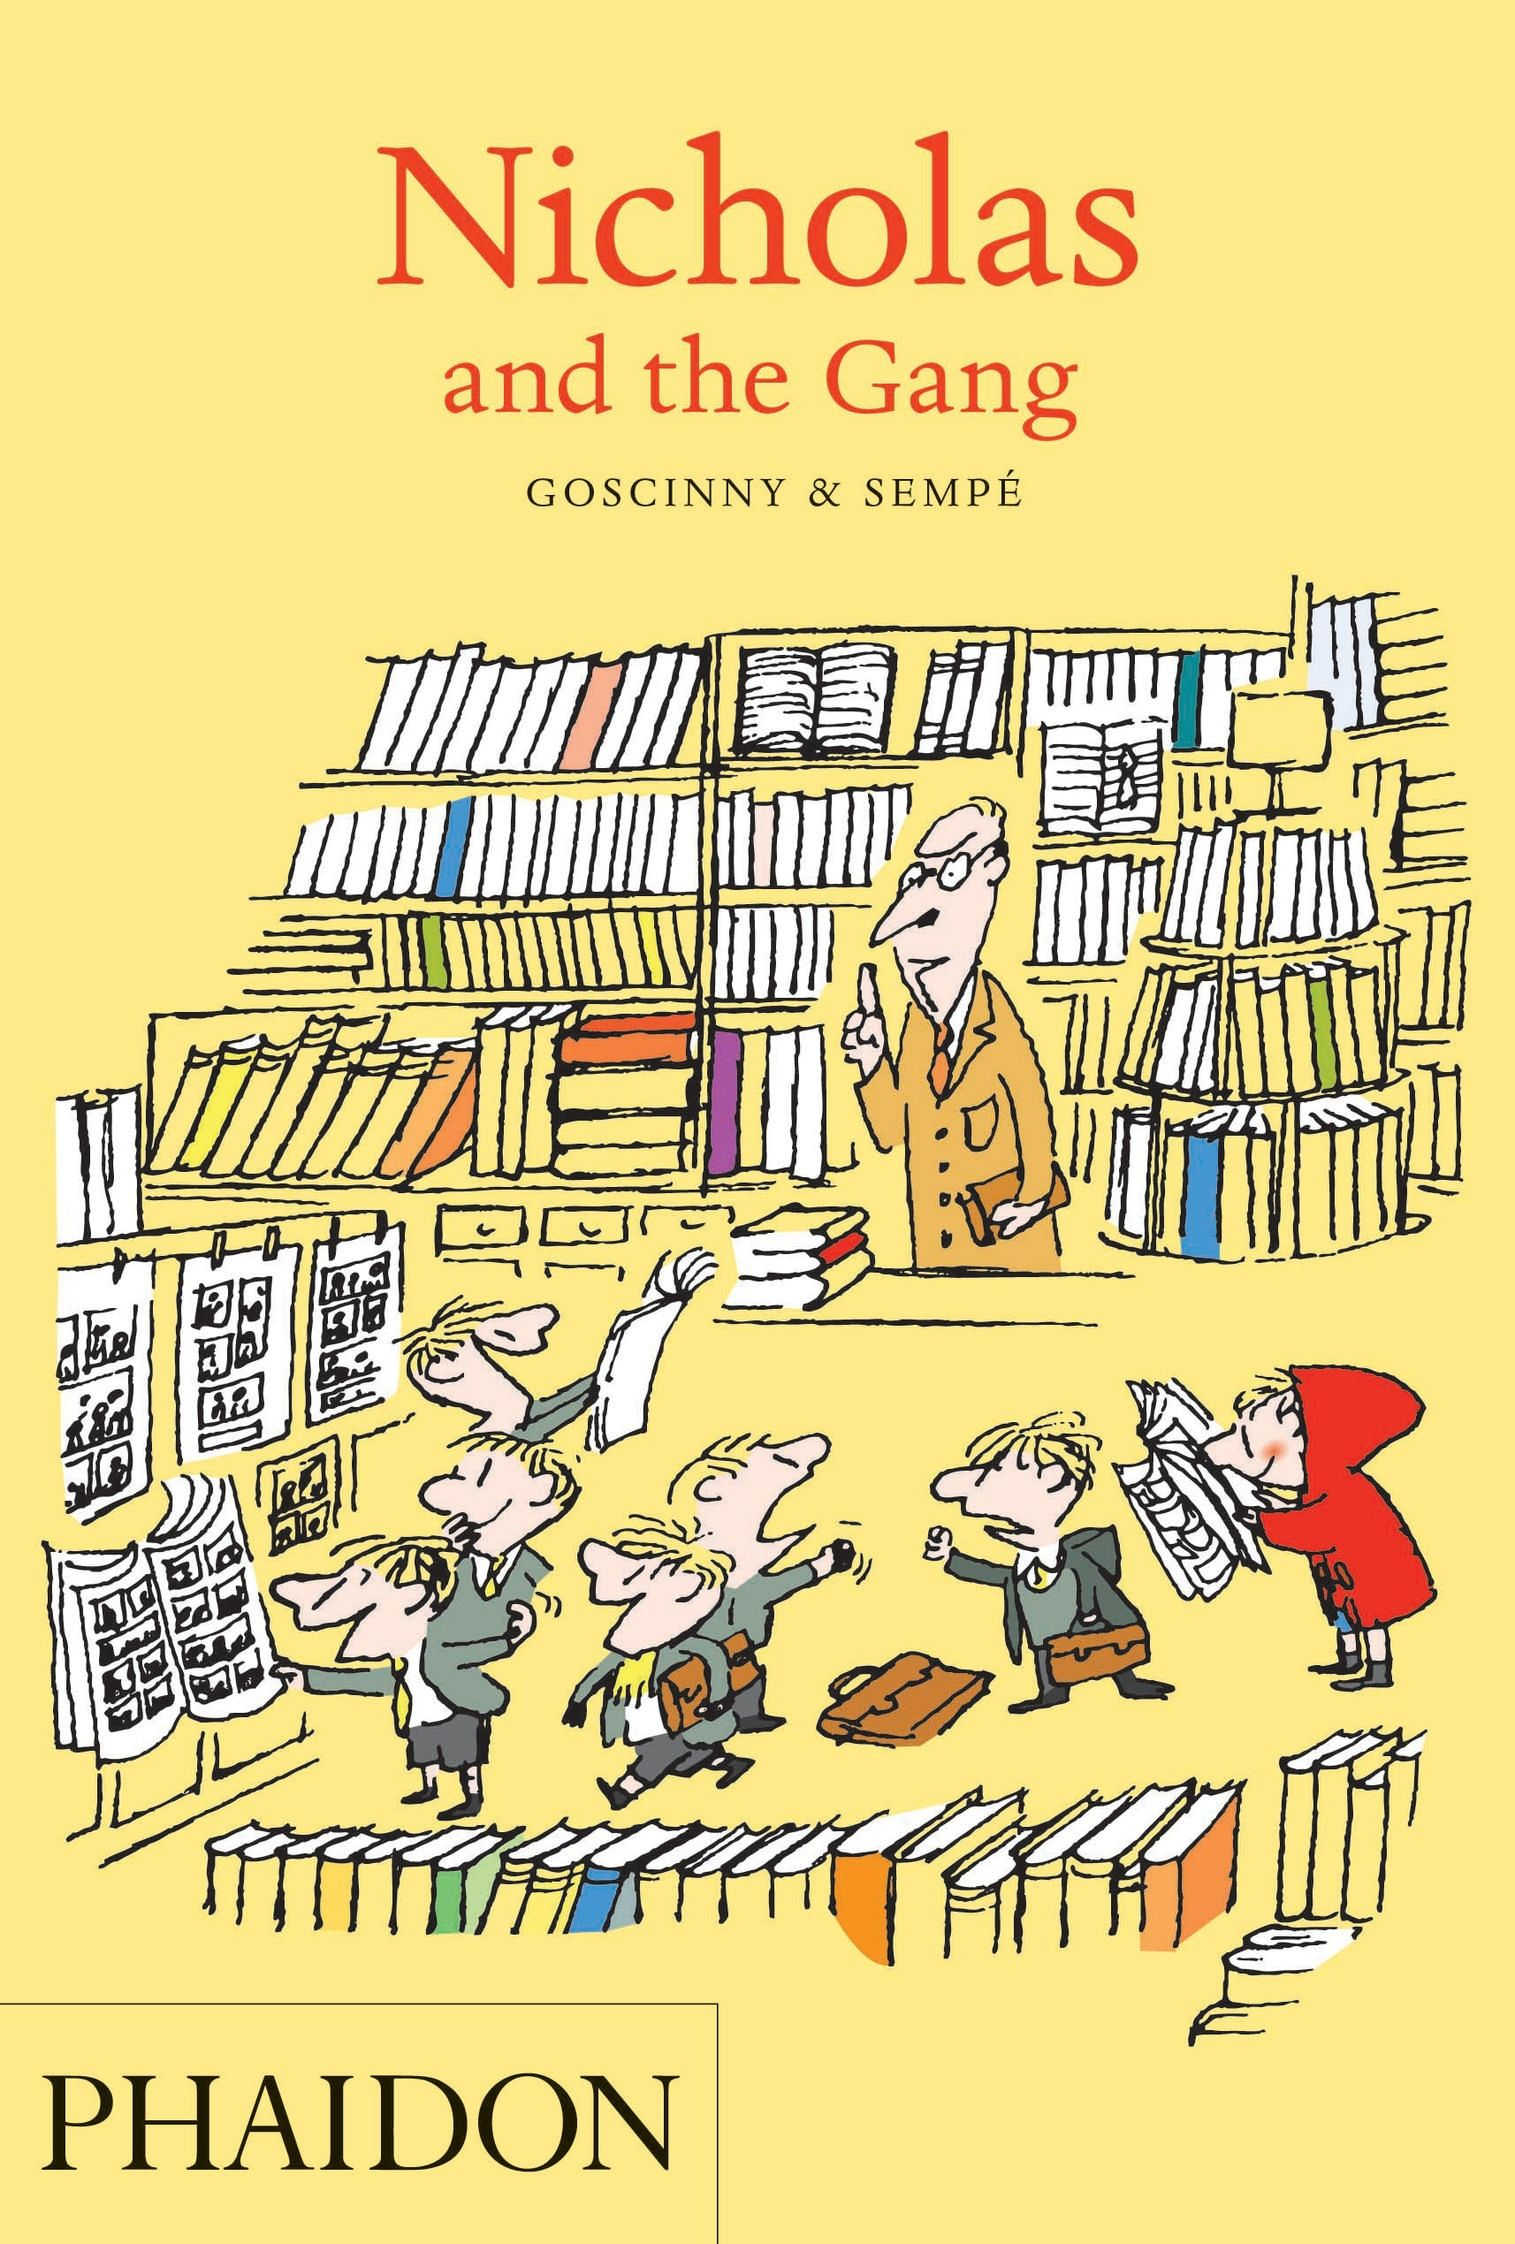 Nicholas and the Gang | 일러스트레이션, 배경화면